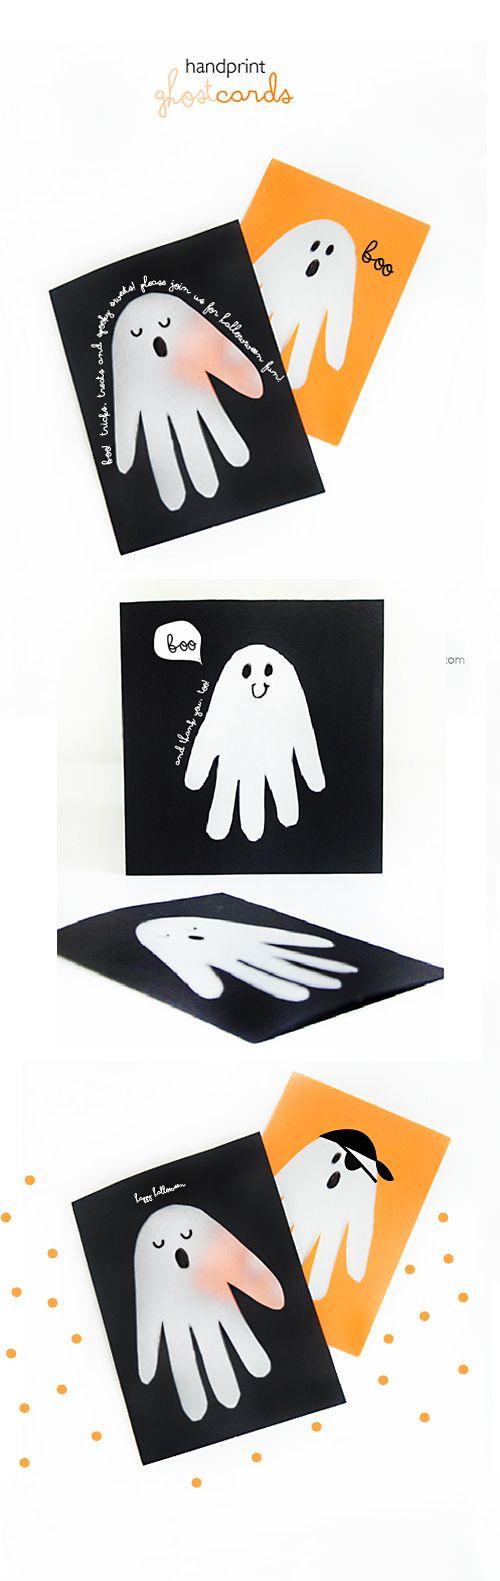 Halloween Cards   Make Transparent Handprint Ghost Cards   http://www.willowday.net/2014/10/handprint-ghost-cards/ willowday